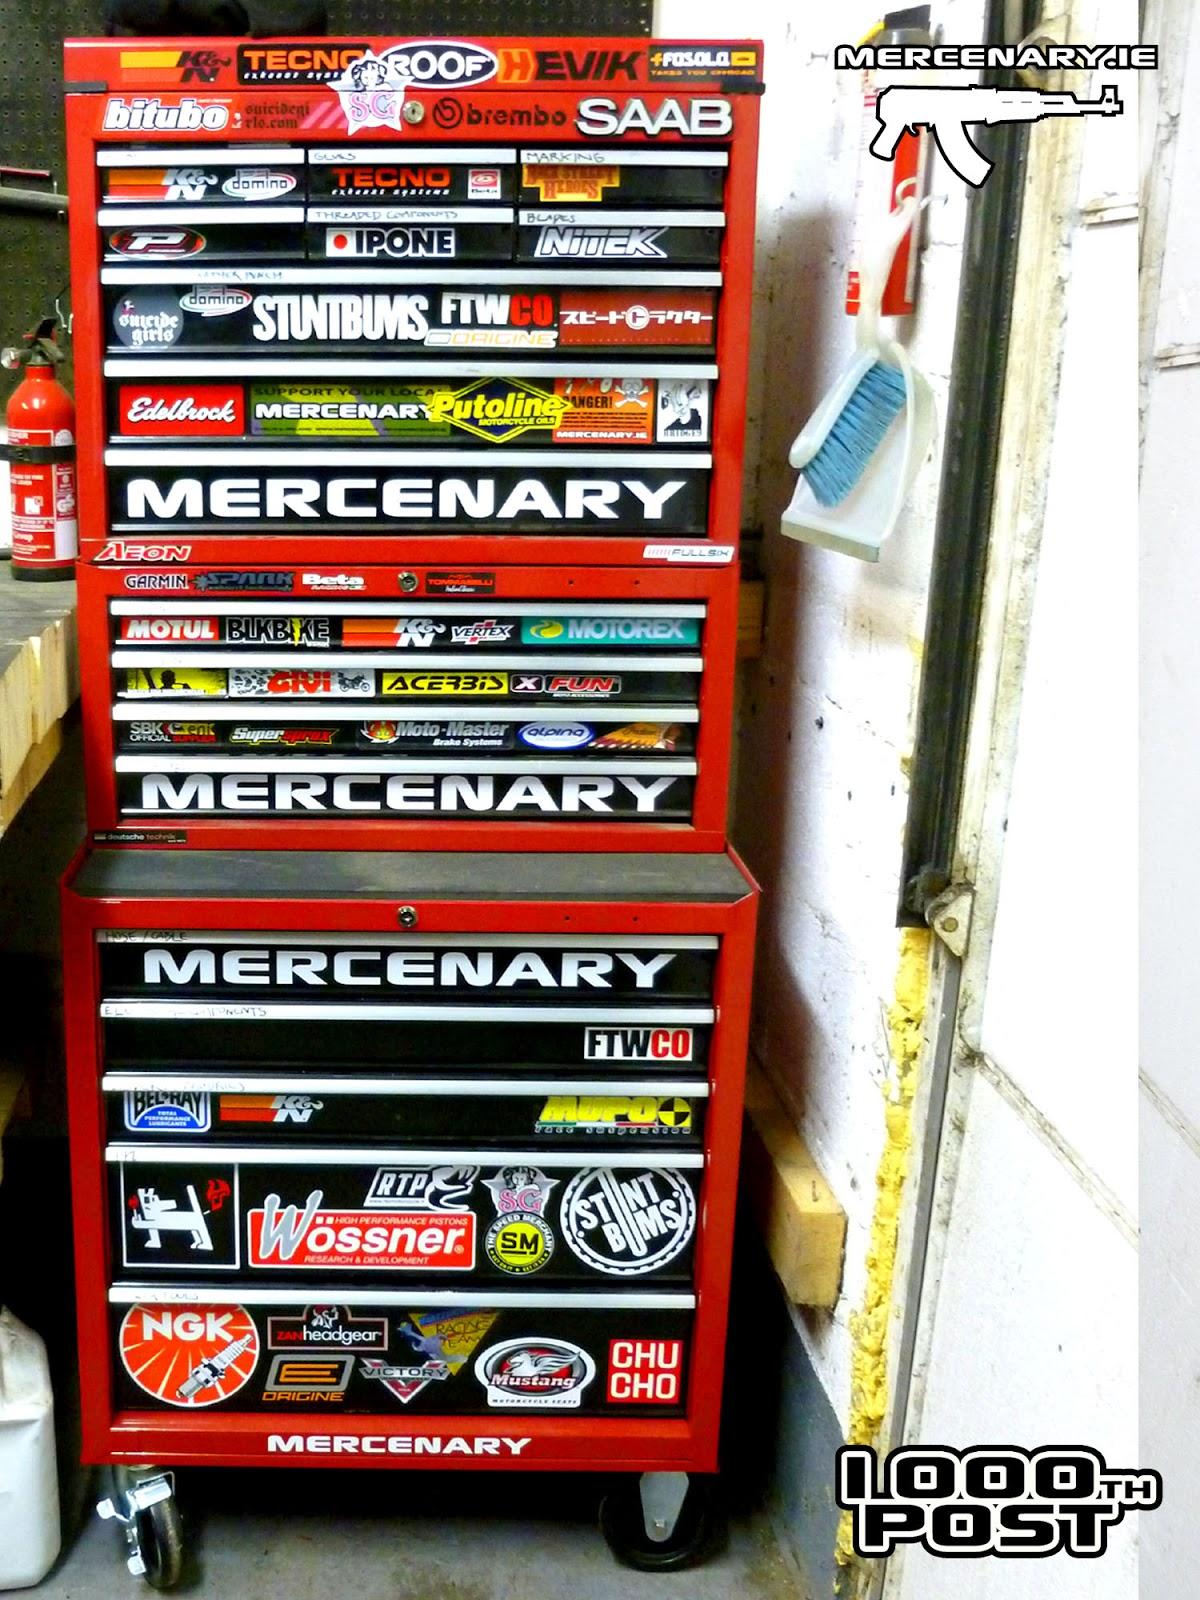 Mercenary Garage Post No 1000